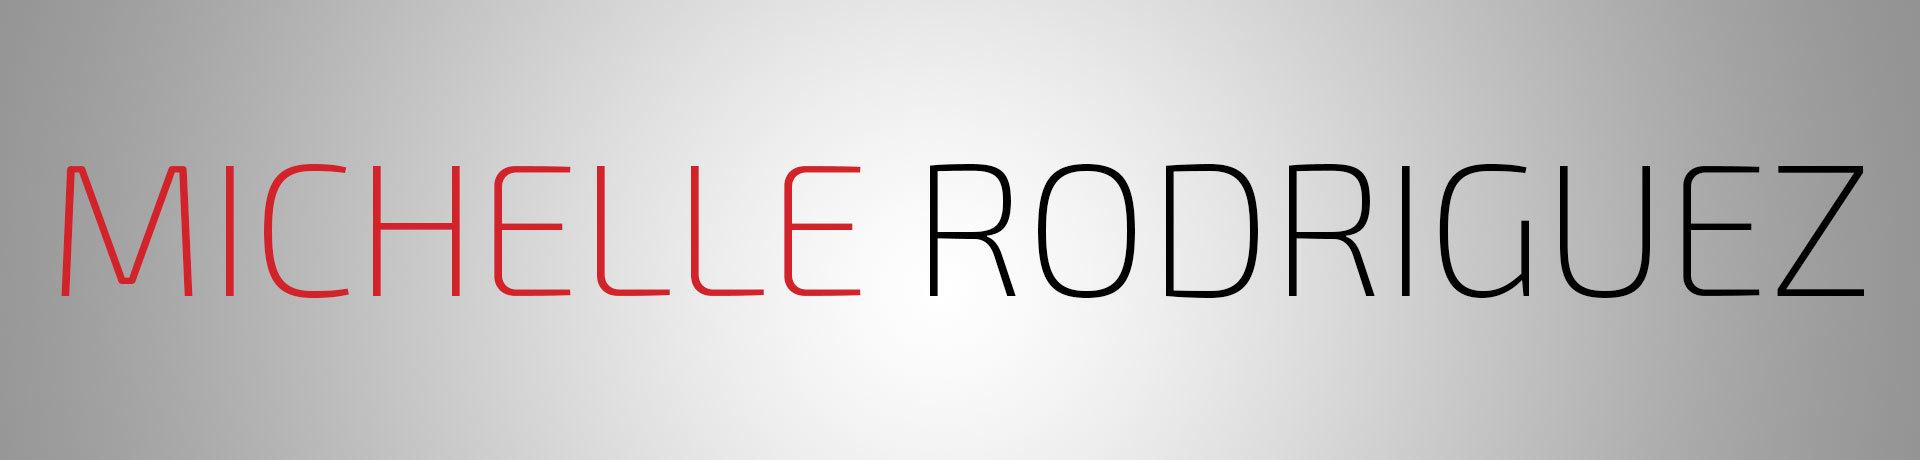 AOC_michelle_rodriguez_1920x460.jpg?mtime=20190227173826#asset:805297